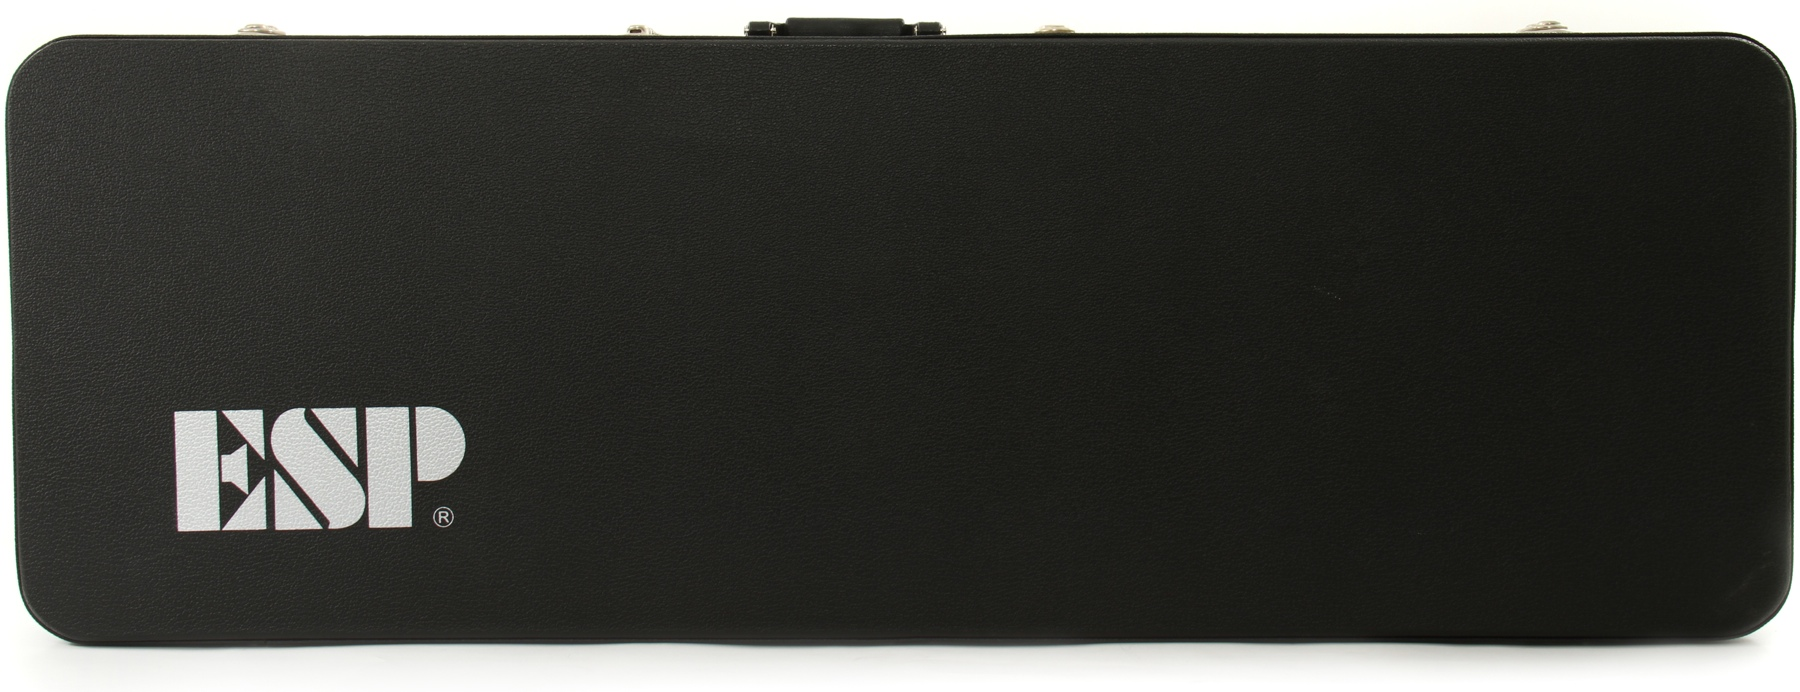 ESP CMHXLFFLH MH XL Left Hand Guitar Case Fitting Design for SC60&B and STEFB-7